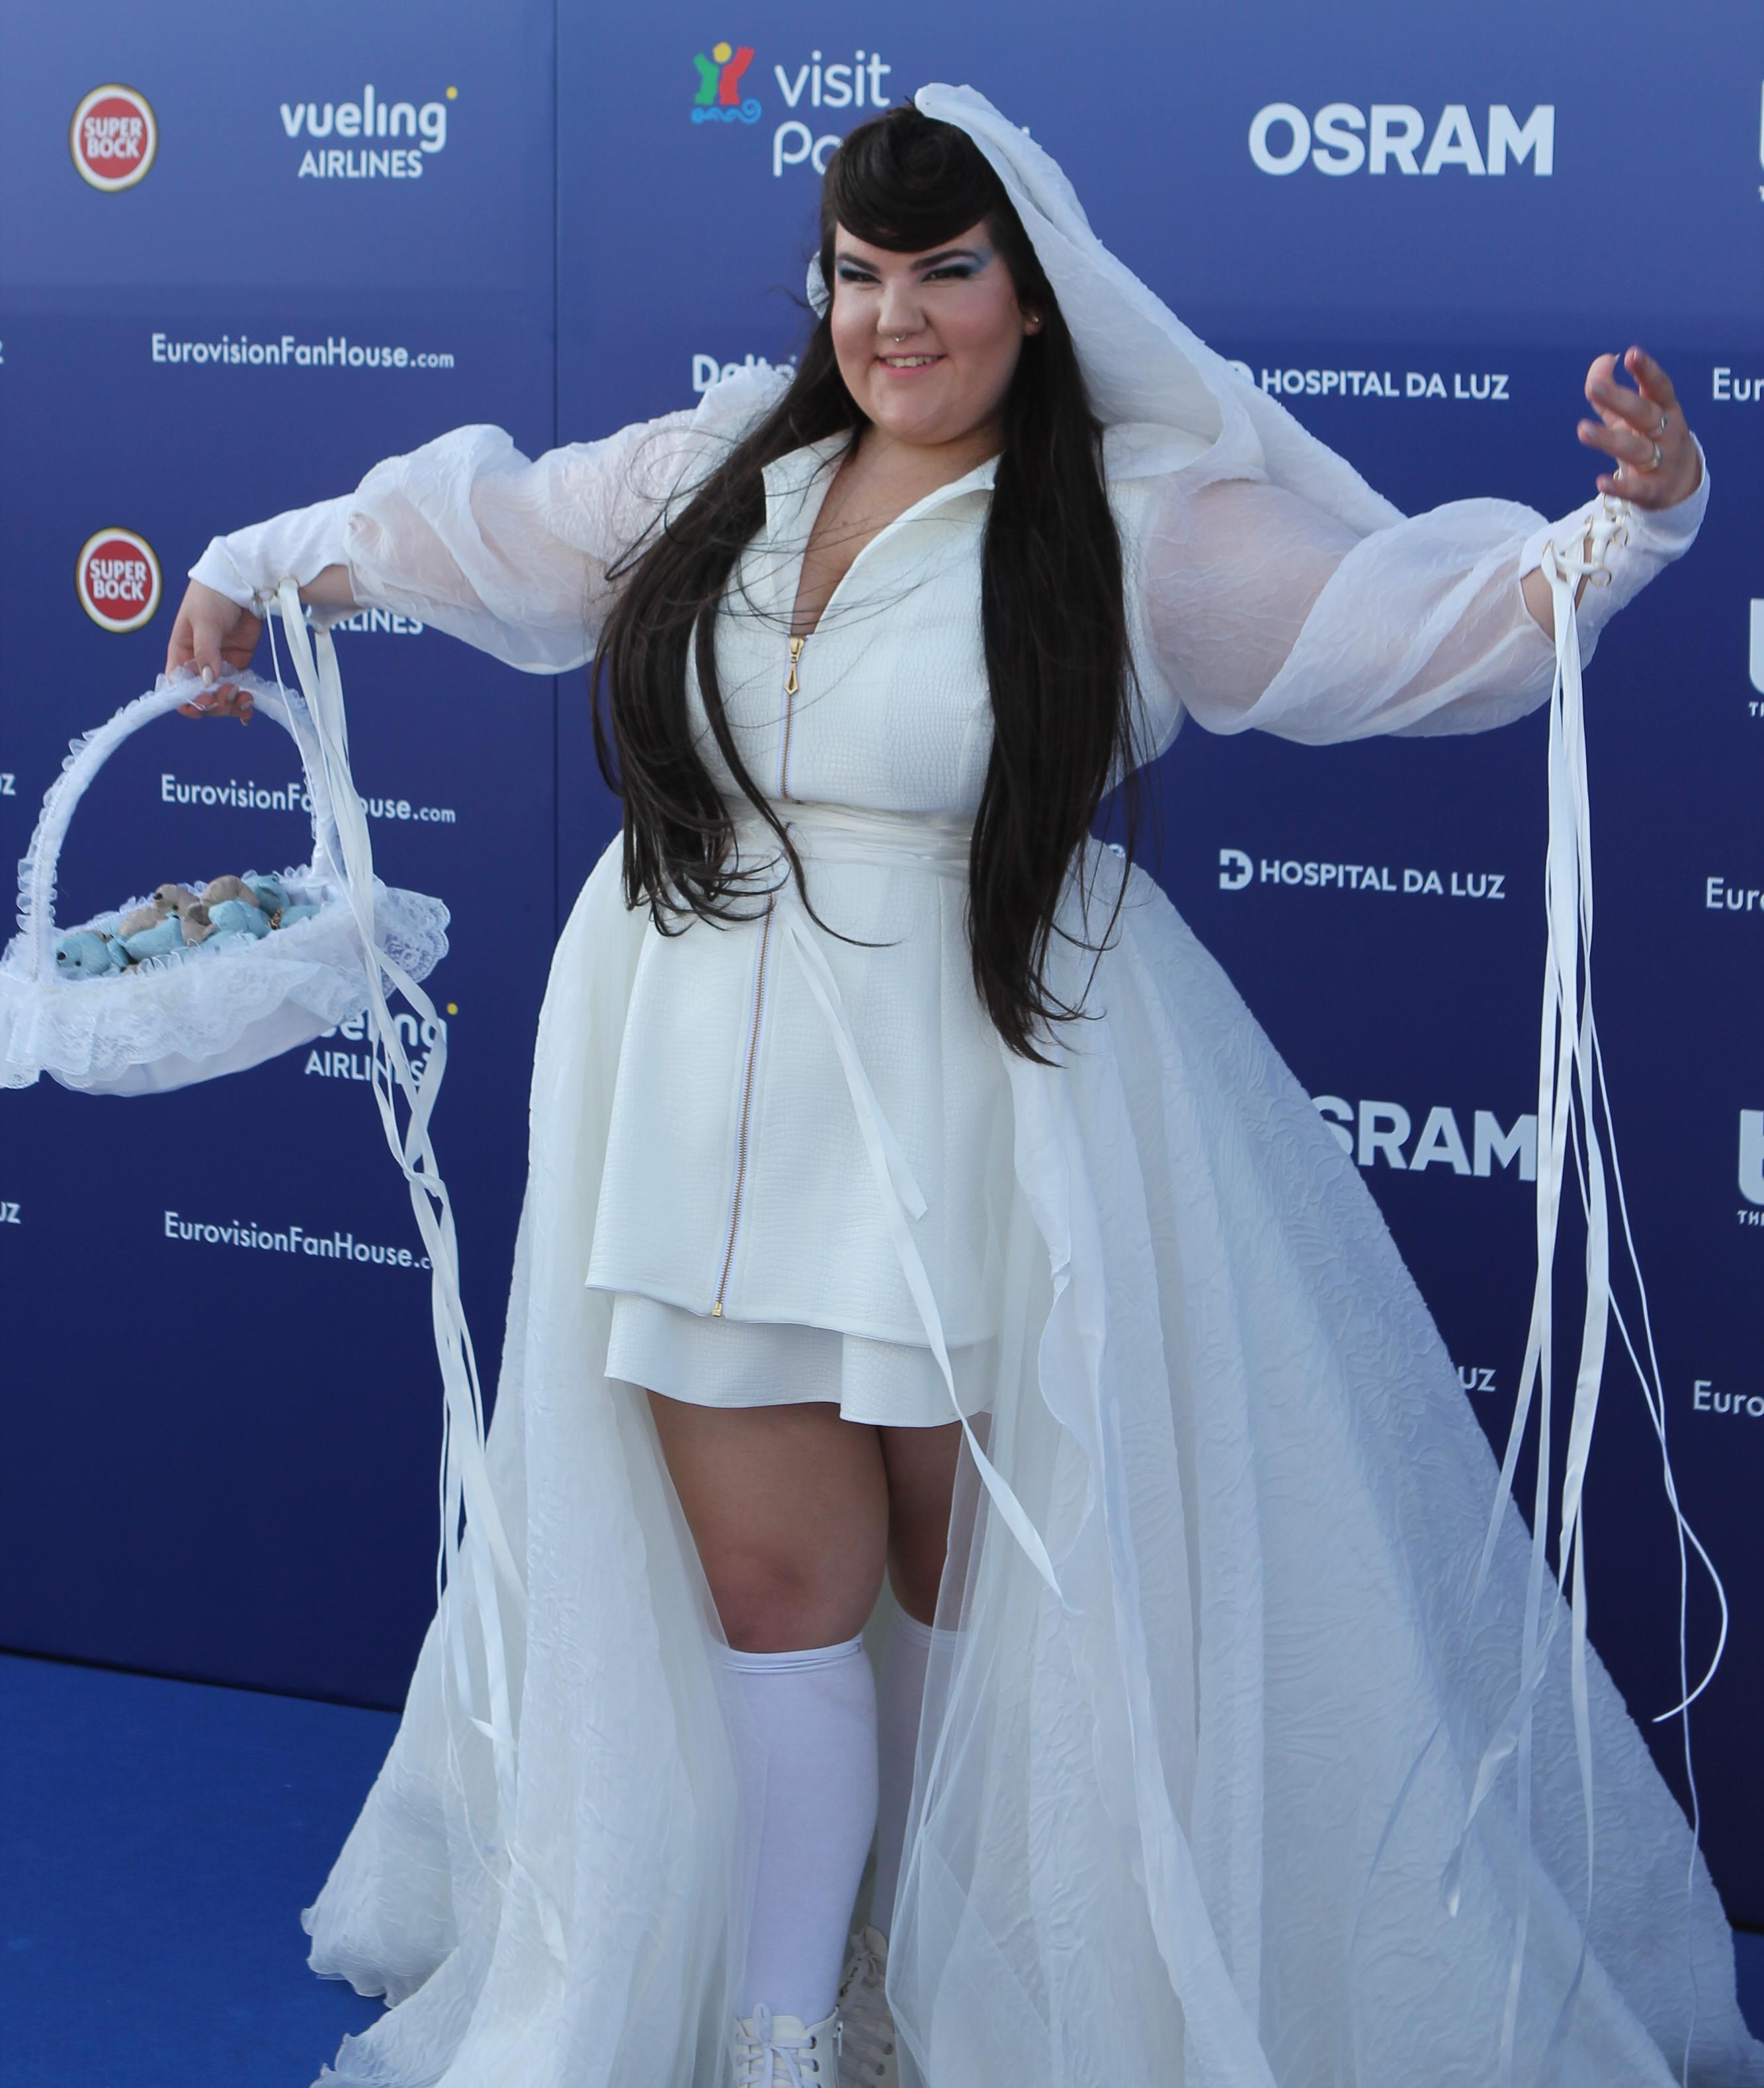 File:Netta Barzilai - Eurovision 2018 - 1.jpg - Wikimedia Commons